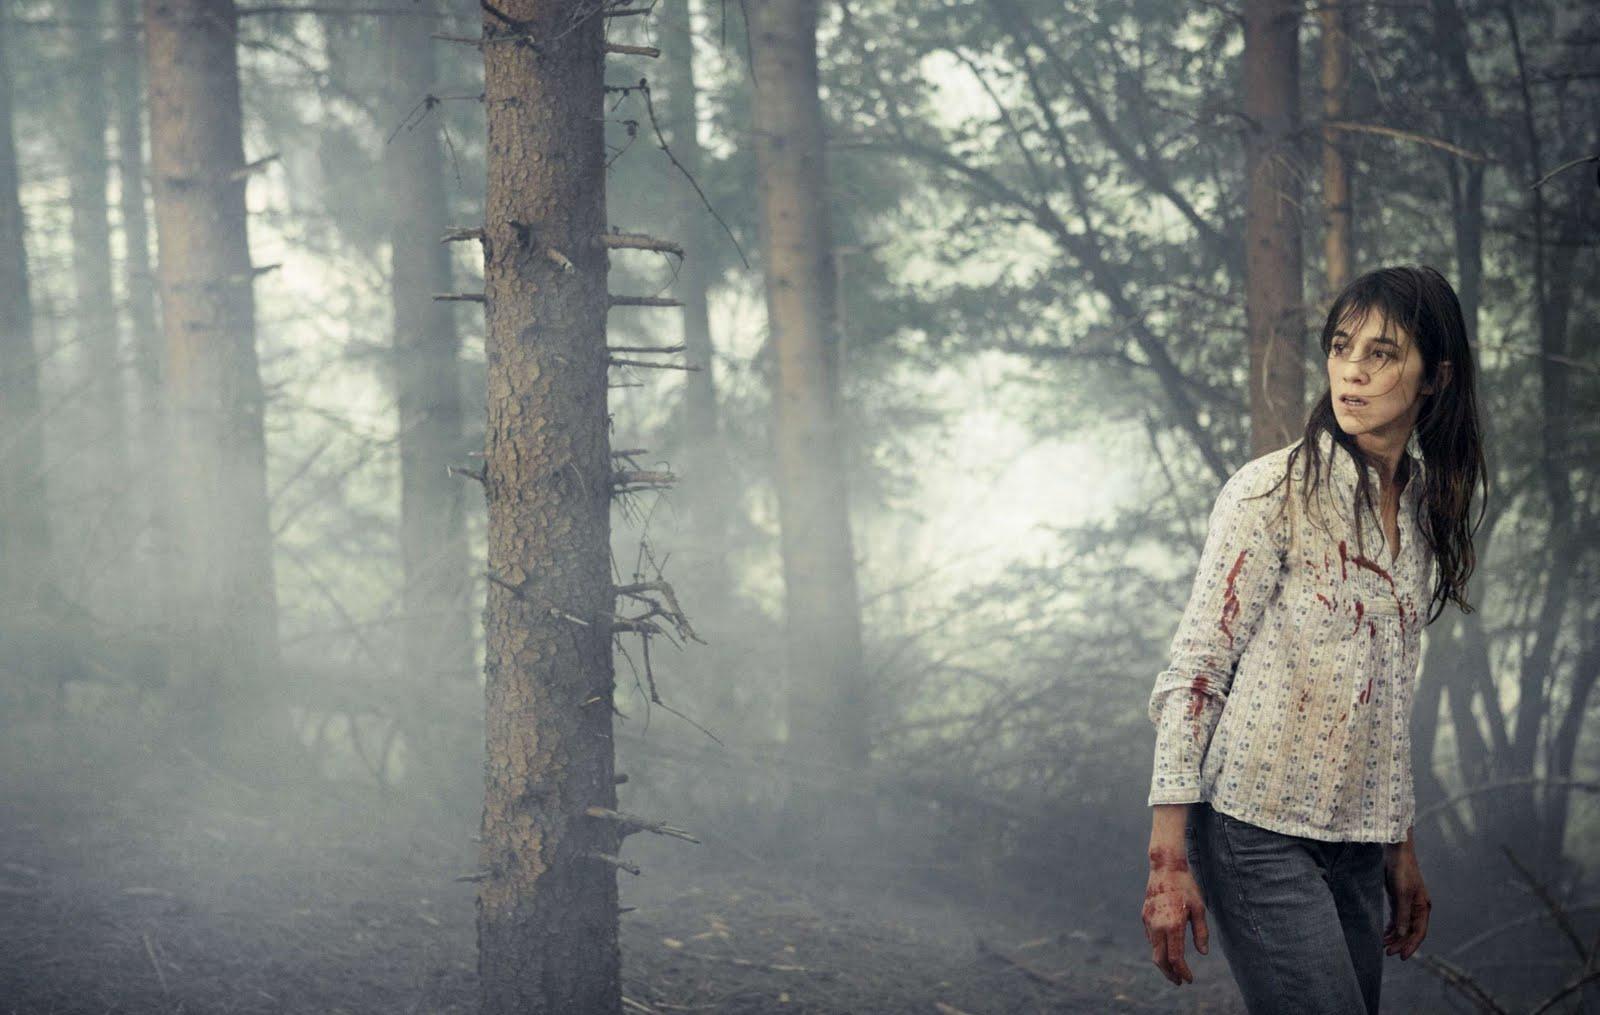 Filmamasoner | Antichrist (2009) and the Nature of Horror